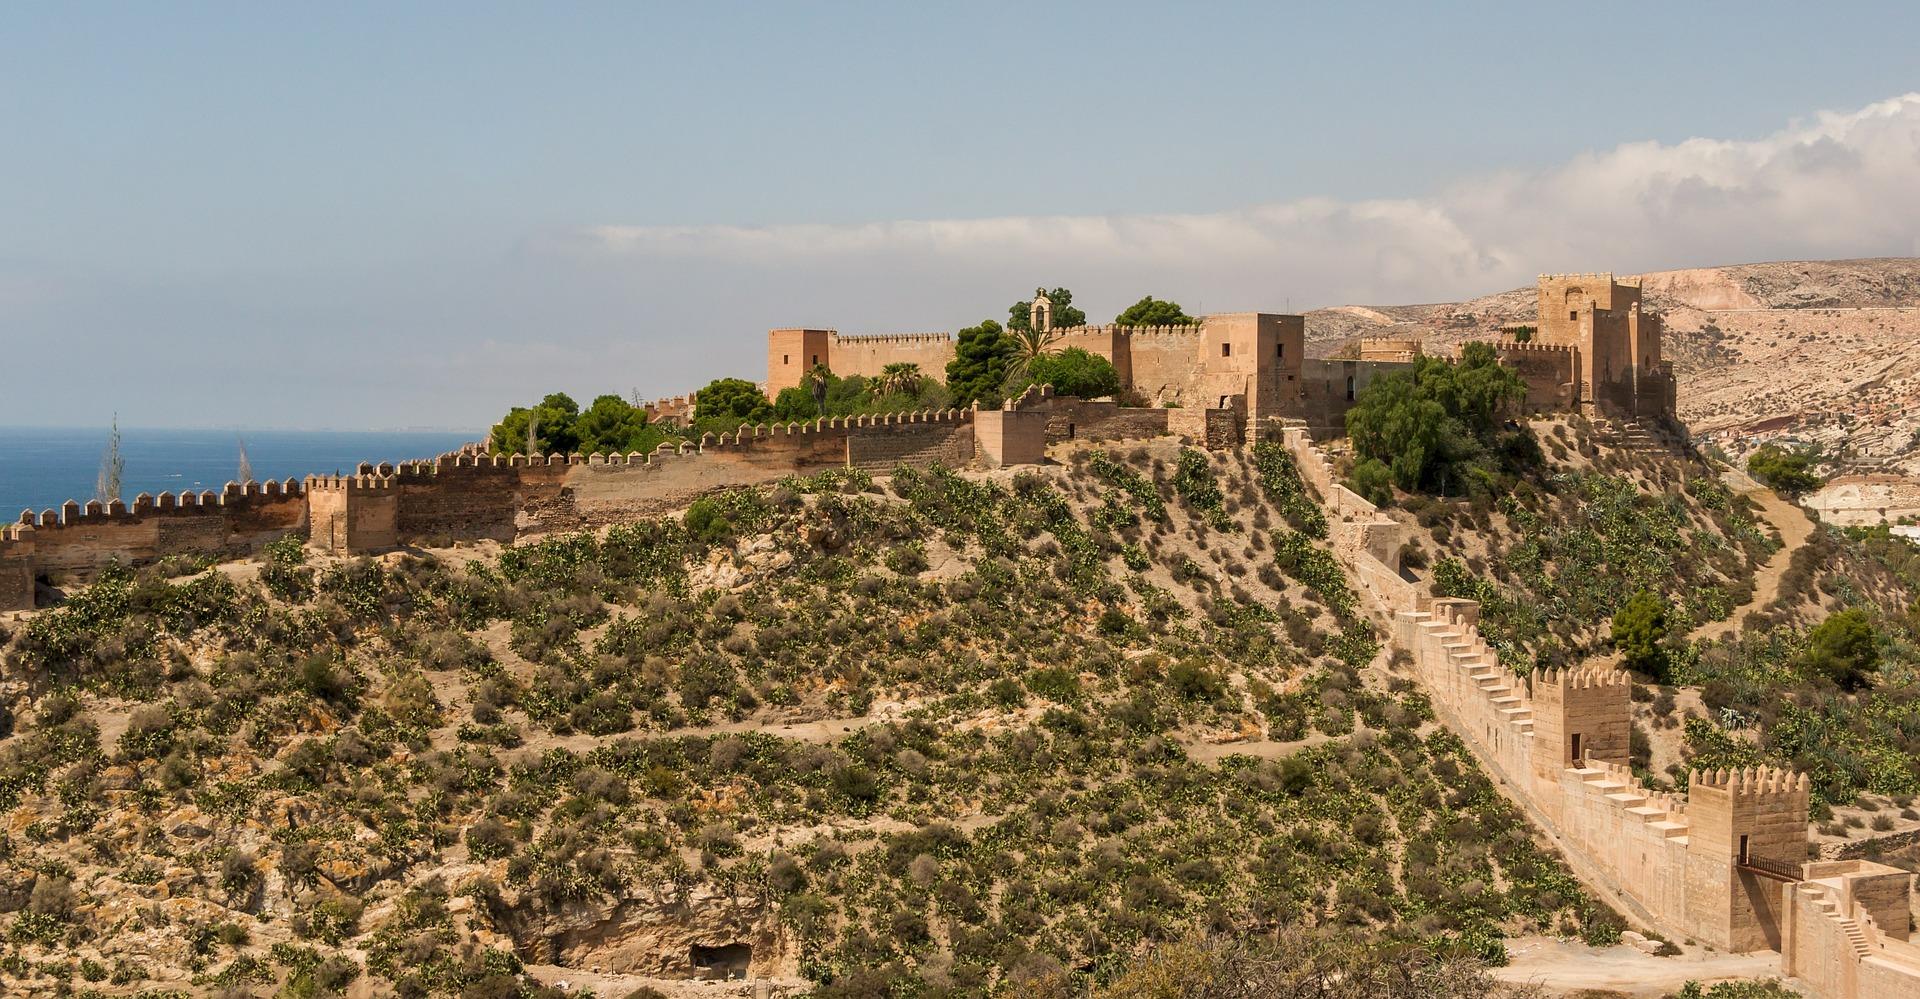 alcazaba-of-almeria-birds-eye-view--pixabay-533934_1920.jpg